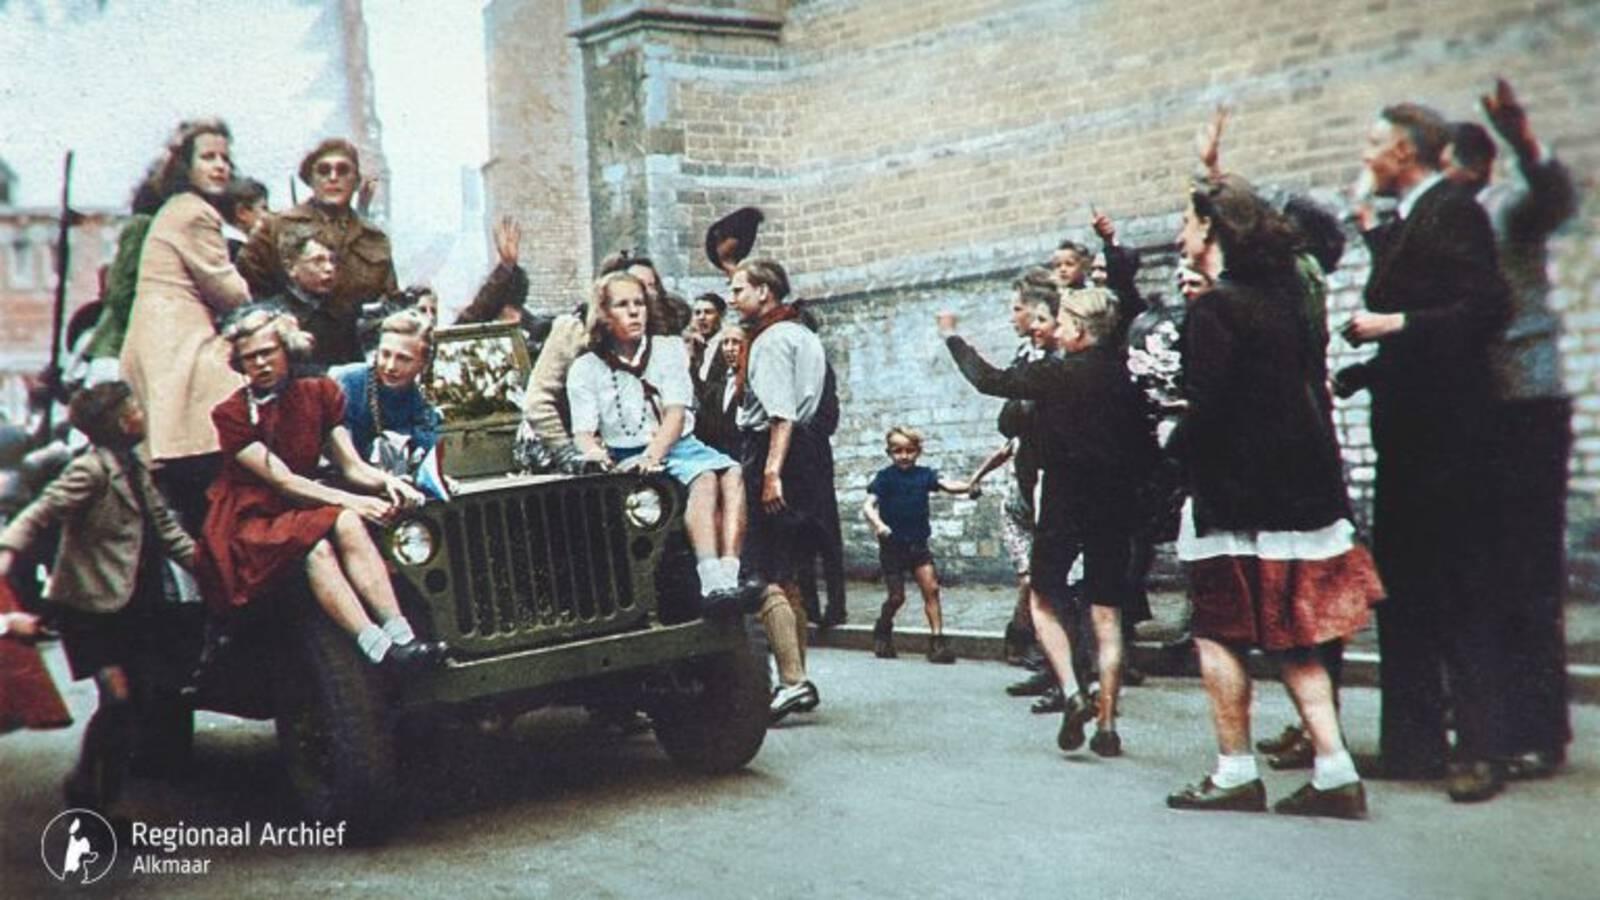 Canadian soldiers welcomed in Alkmaar city in the Netherlands in May 1945, regional archive Alkmaar photo